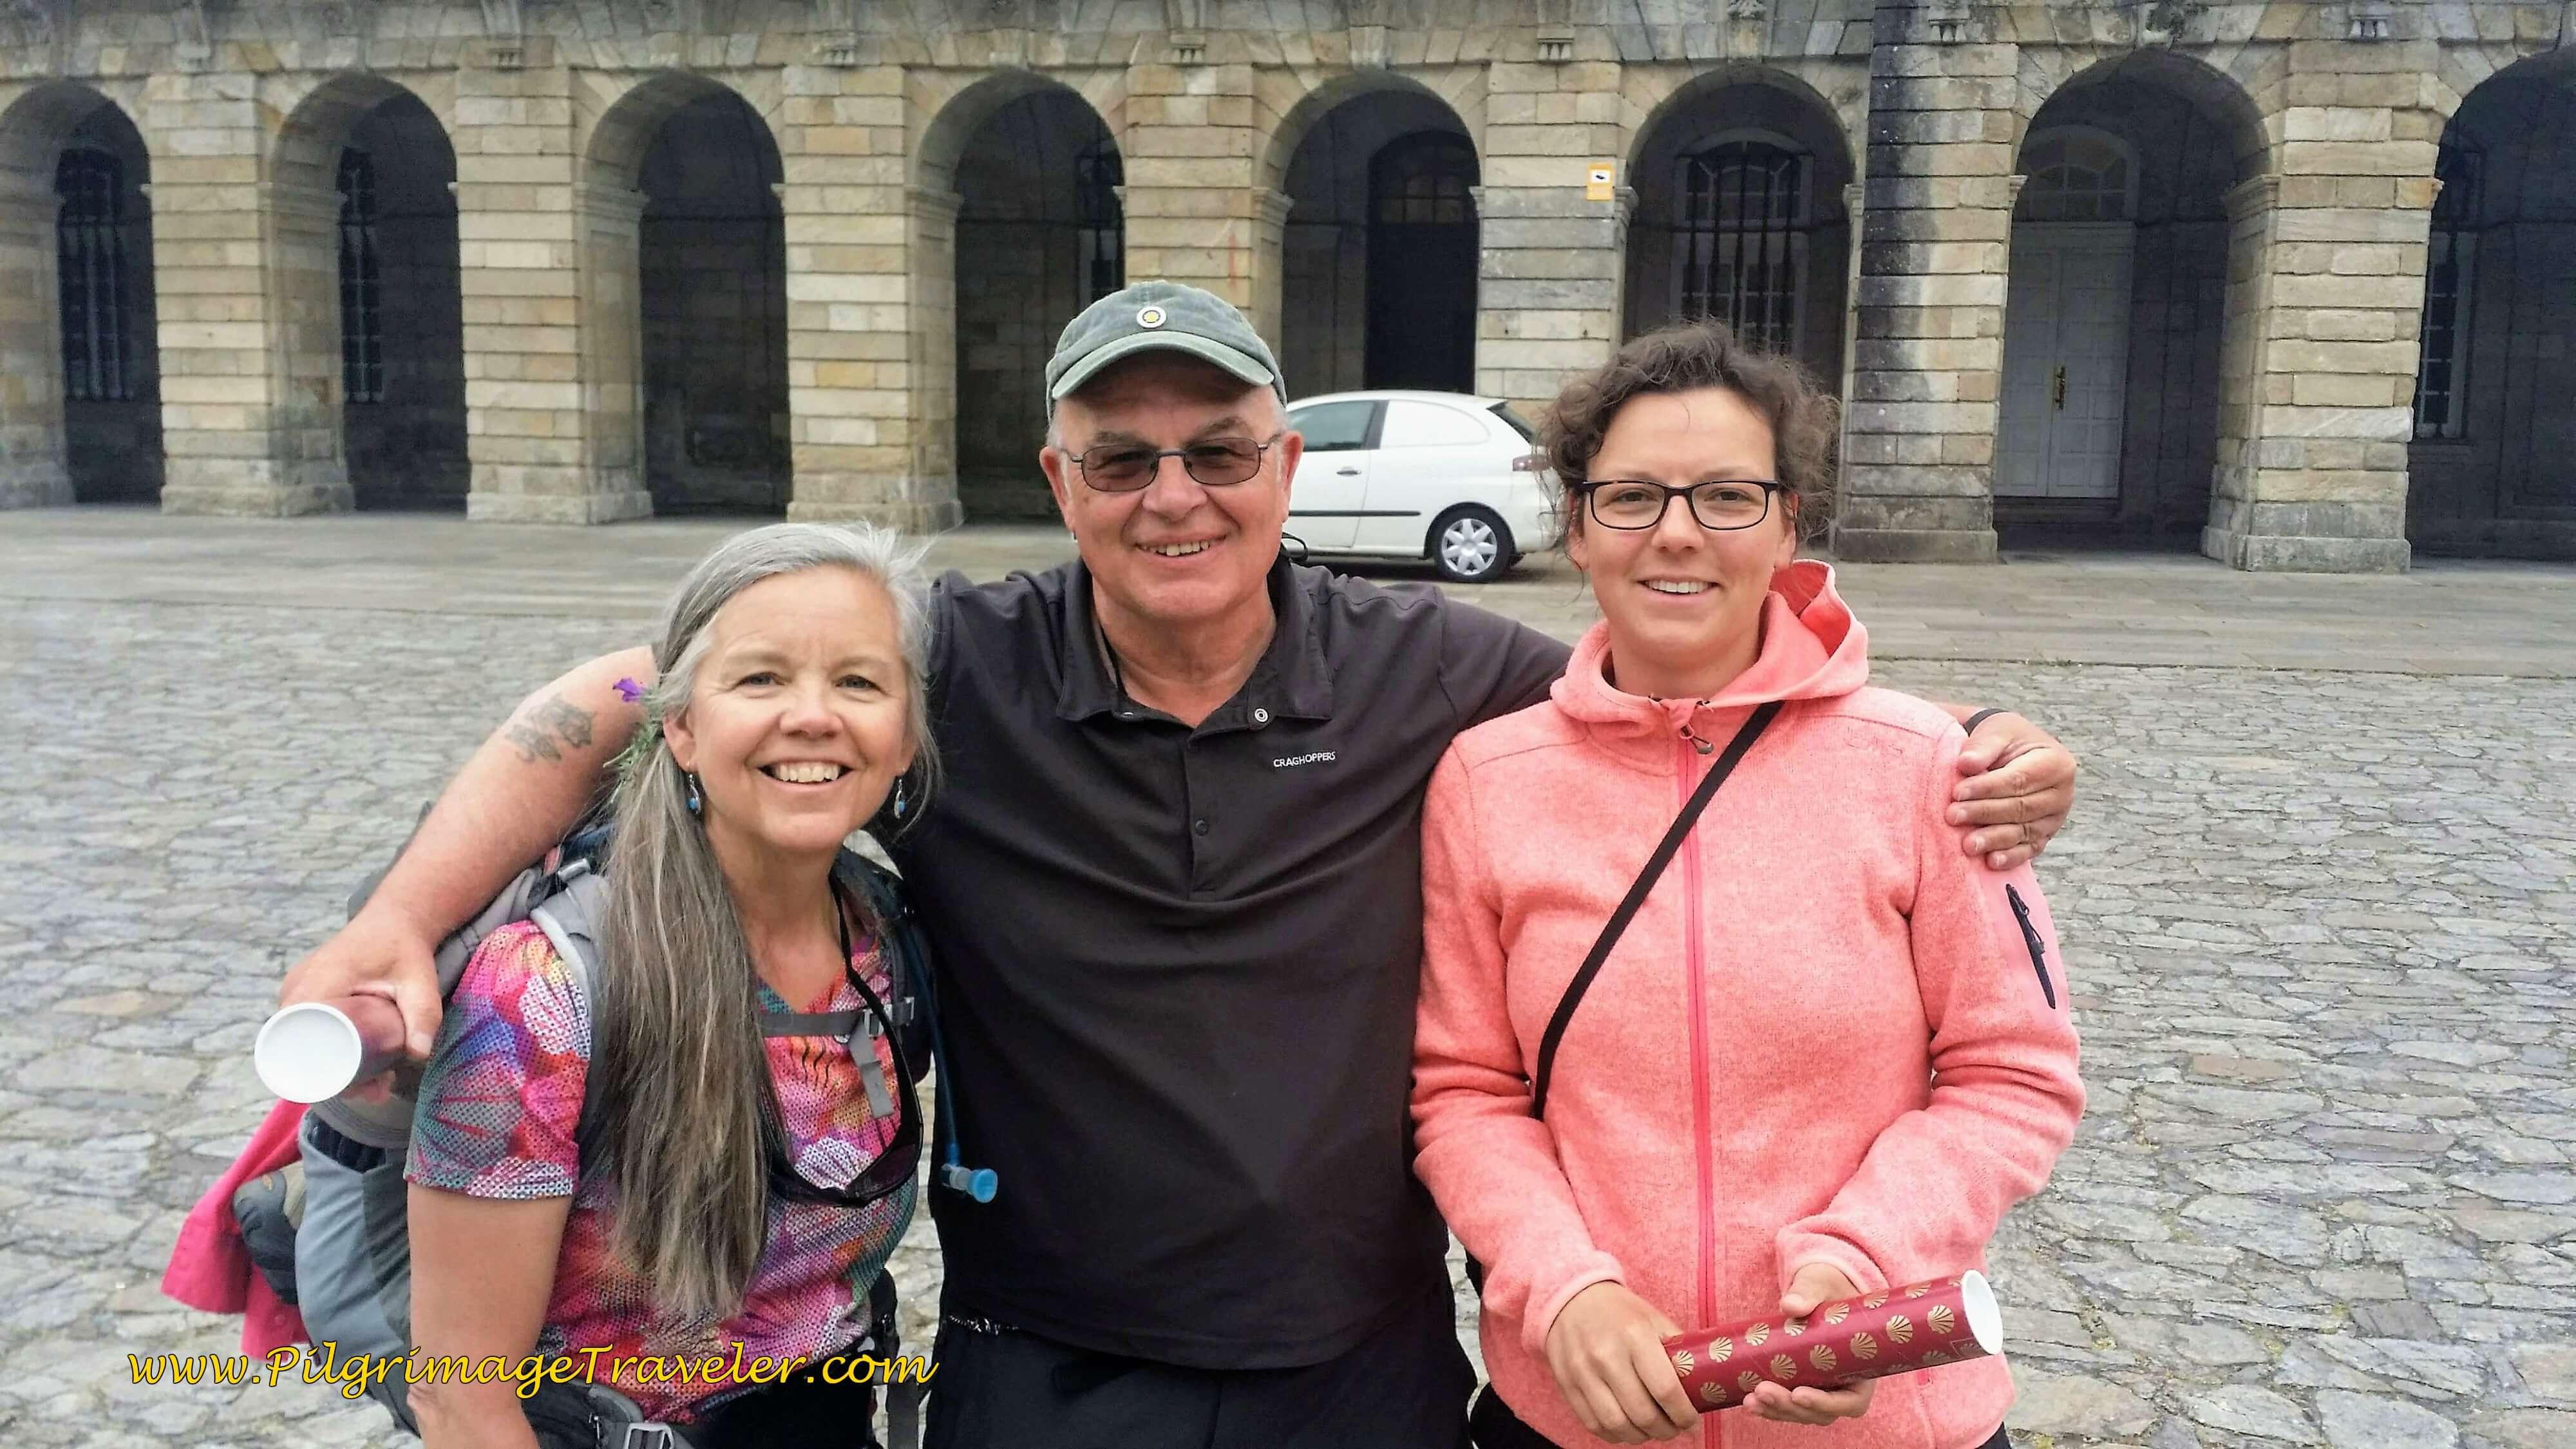 Reunion at Obradoiro ~ Elle, Steve and Lisa